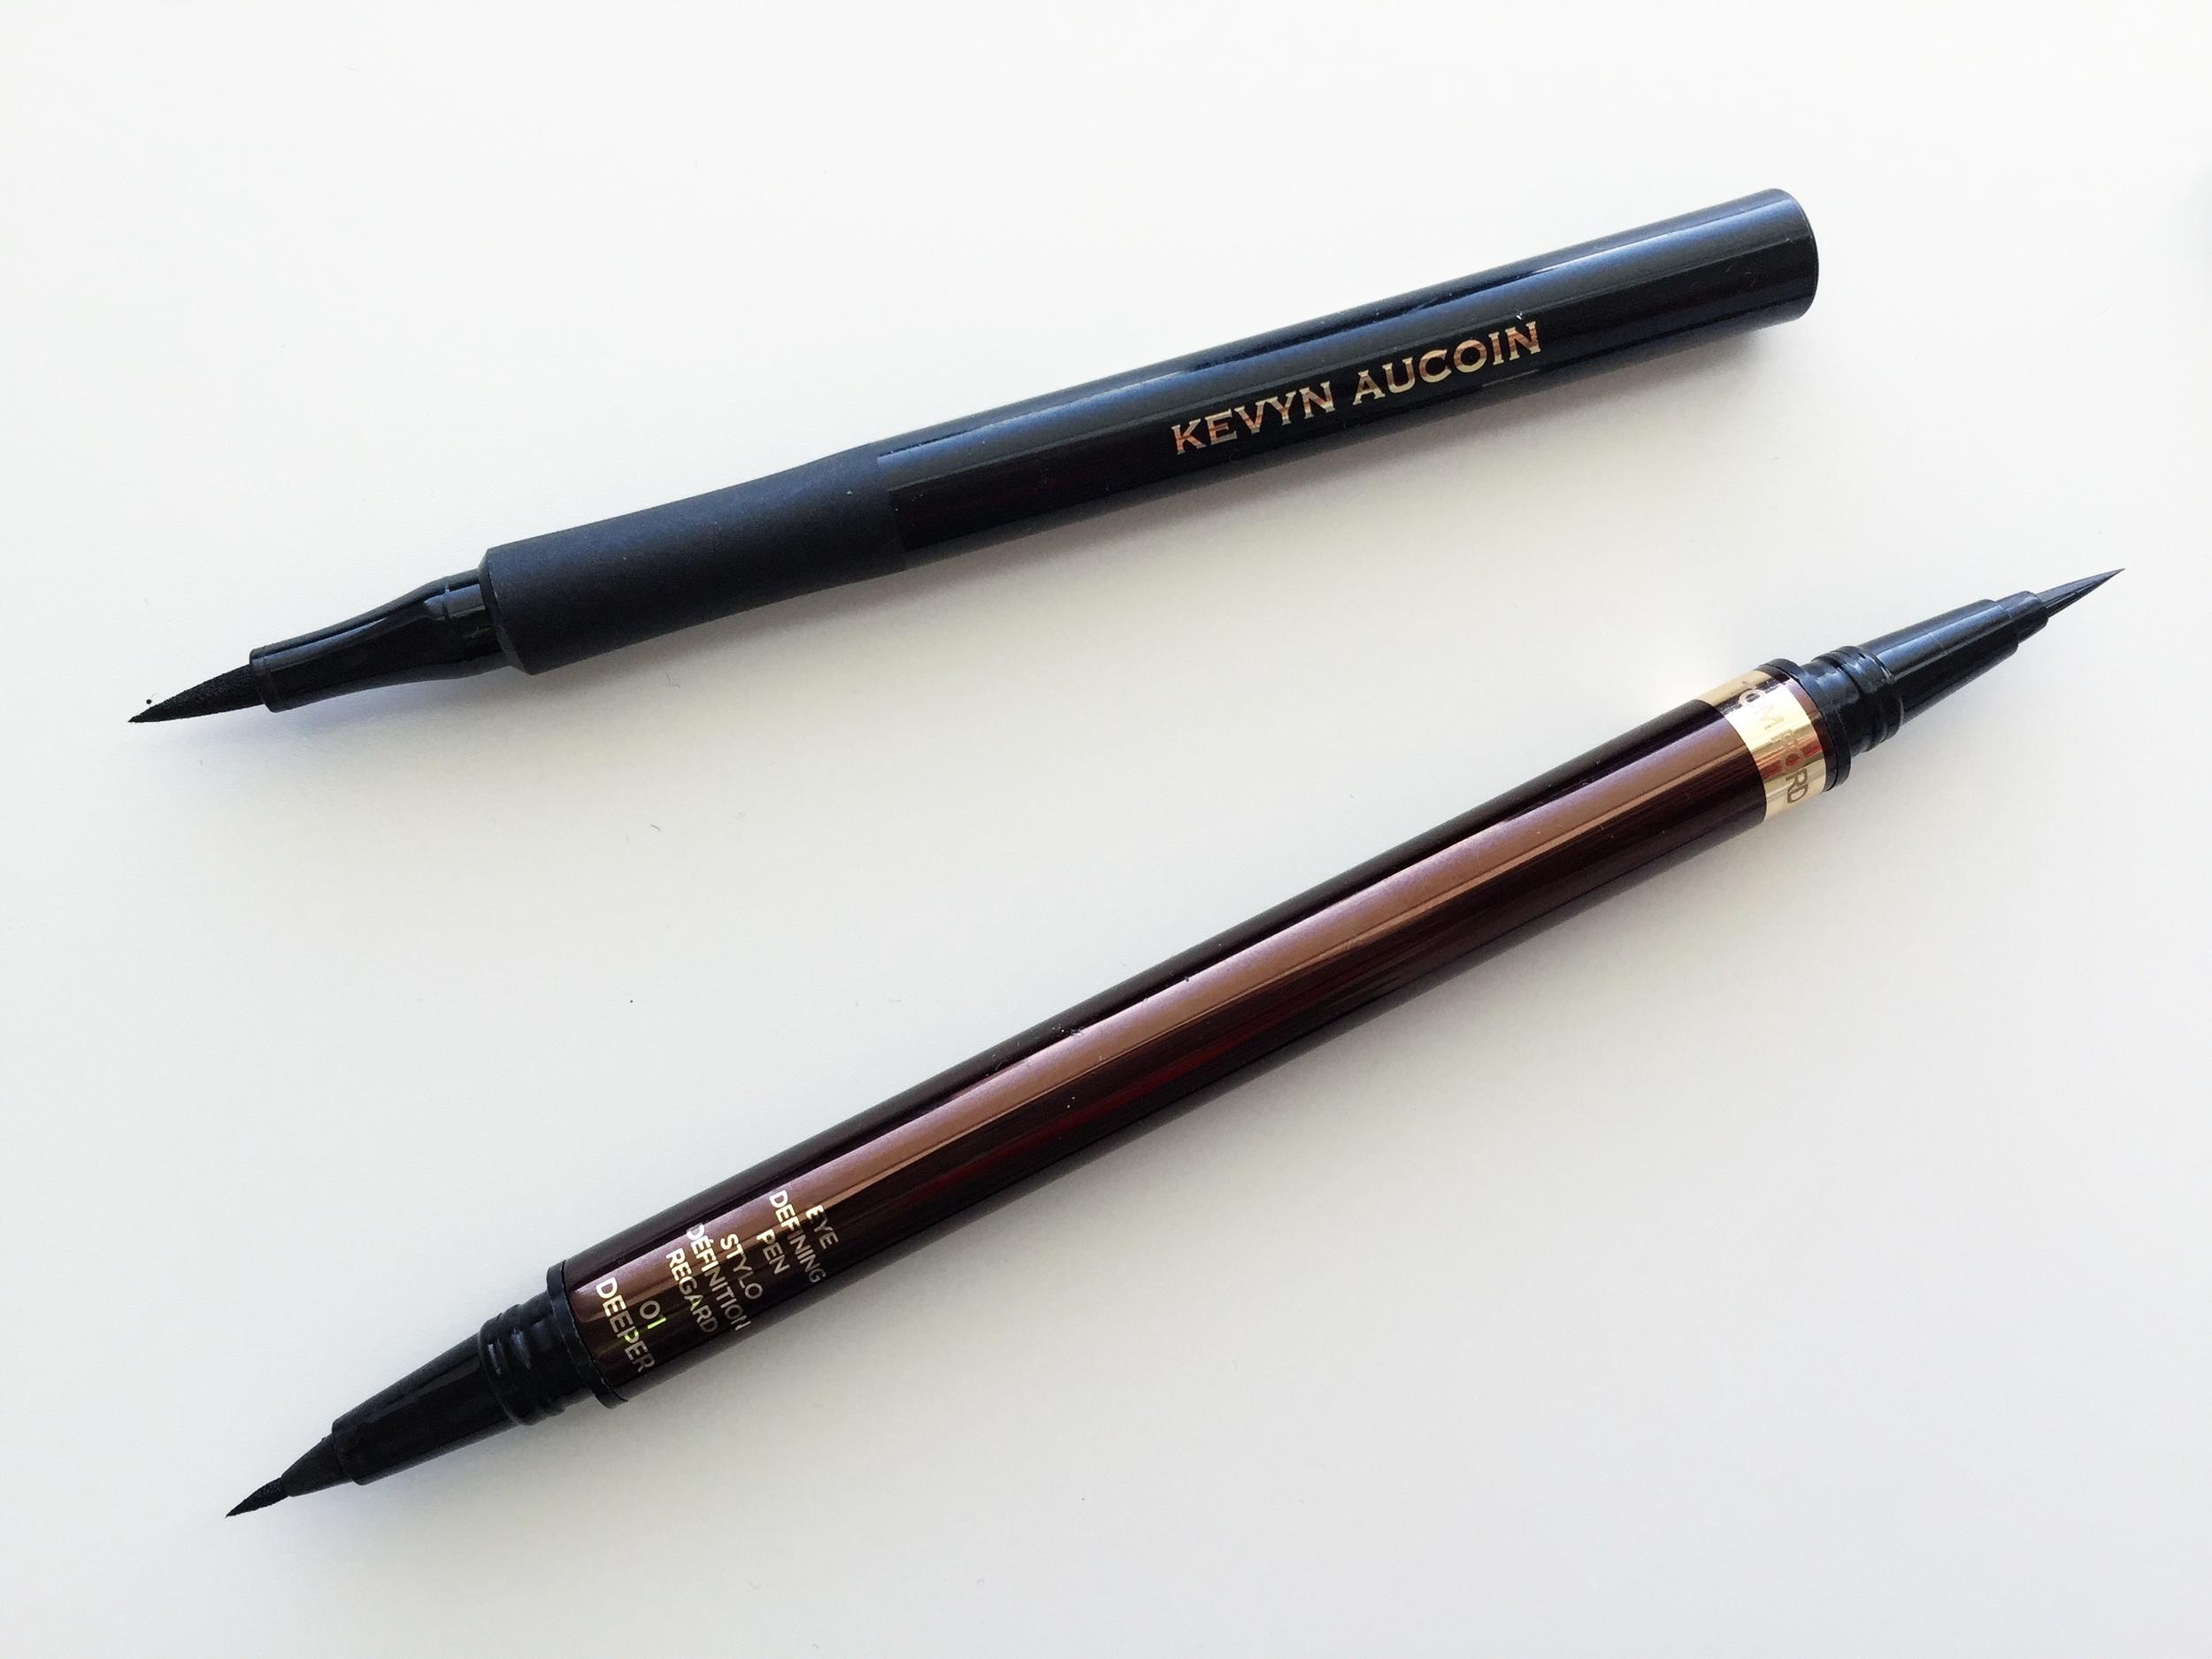 Kevyn Aucoin The Precision Liquid Liner, Tom Ford Eye Defining Pen